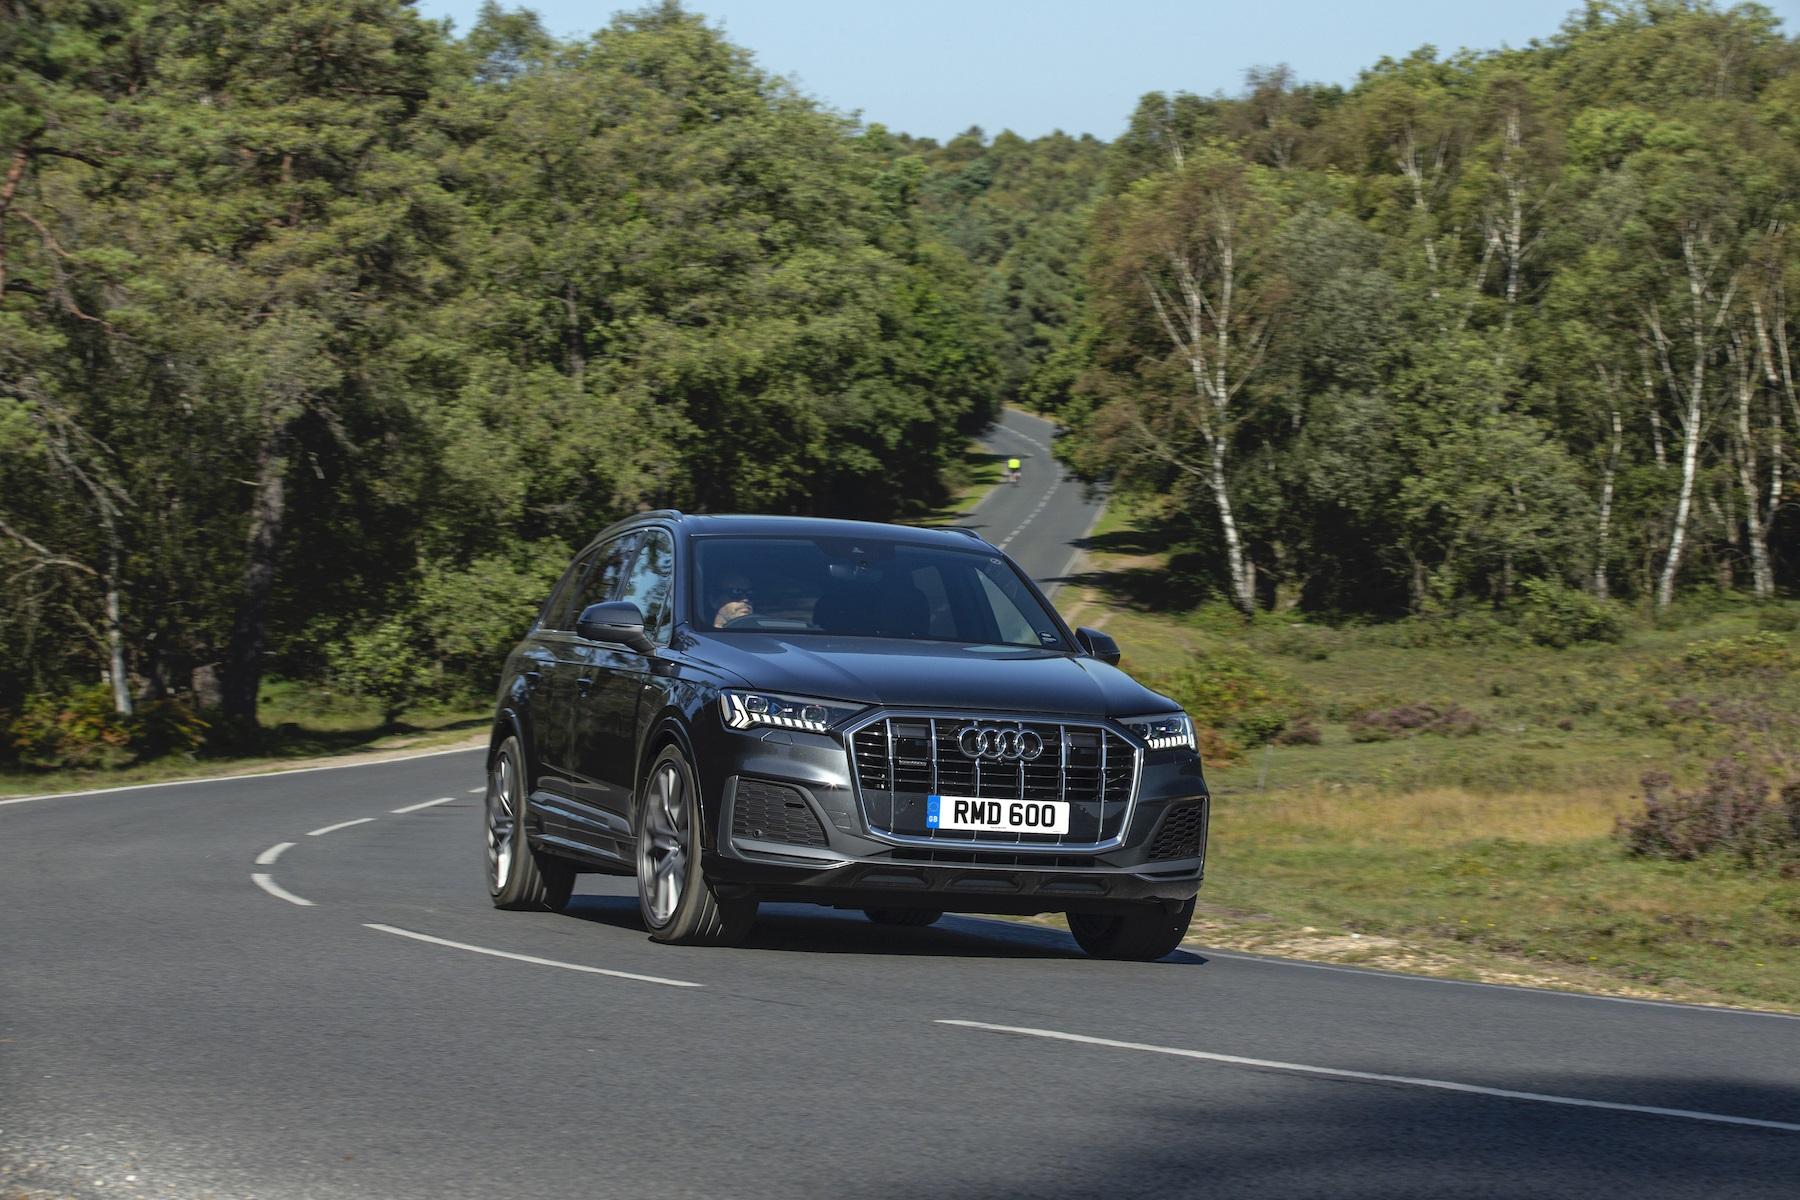 Black Audi Q7 on the road